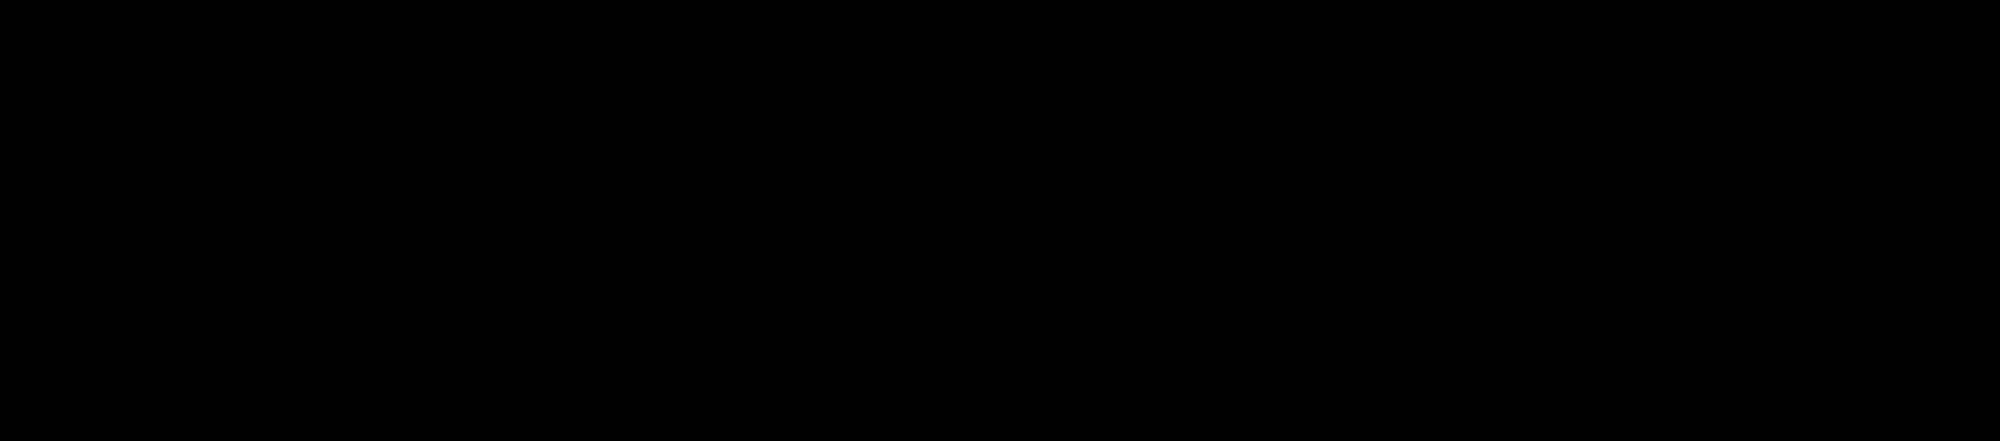 Recaro